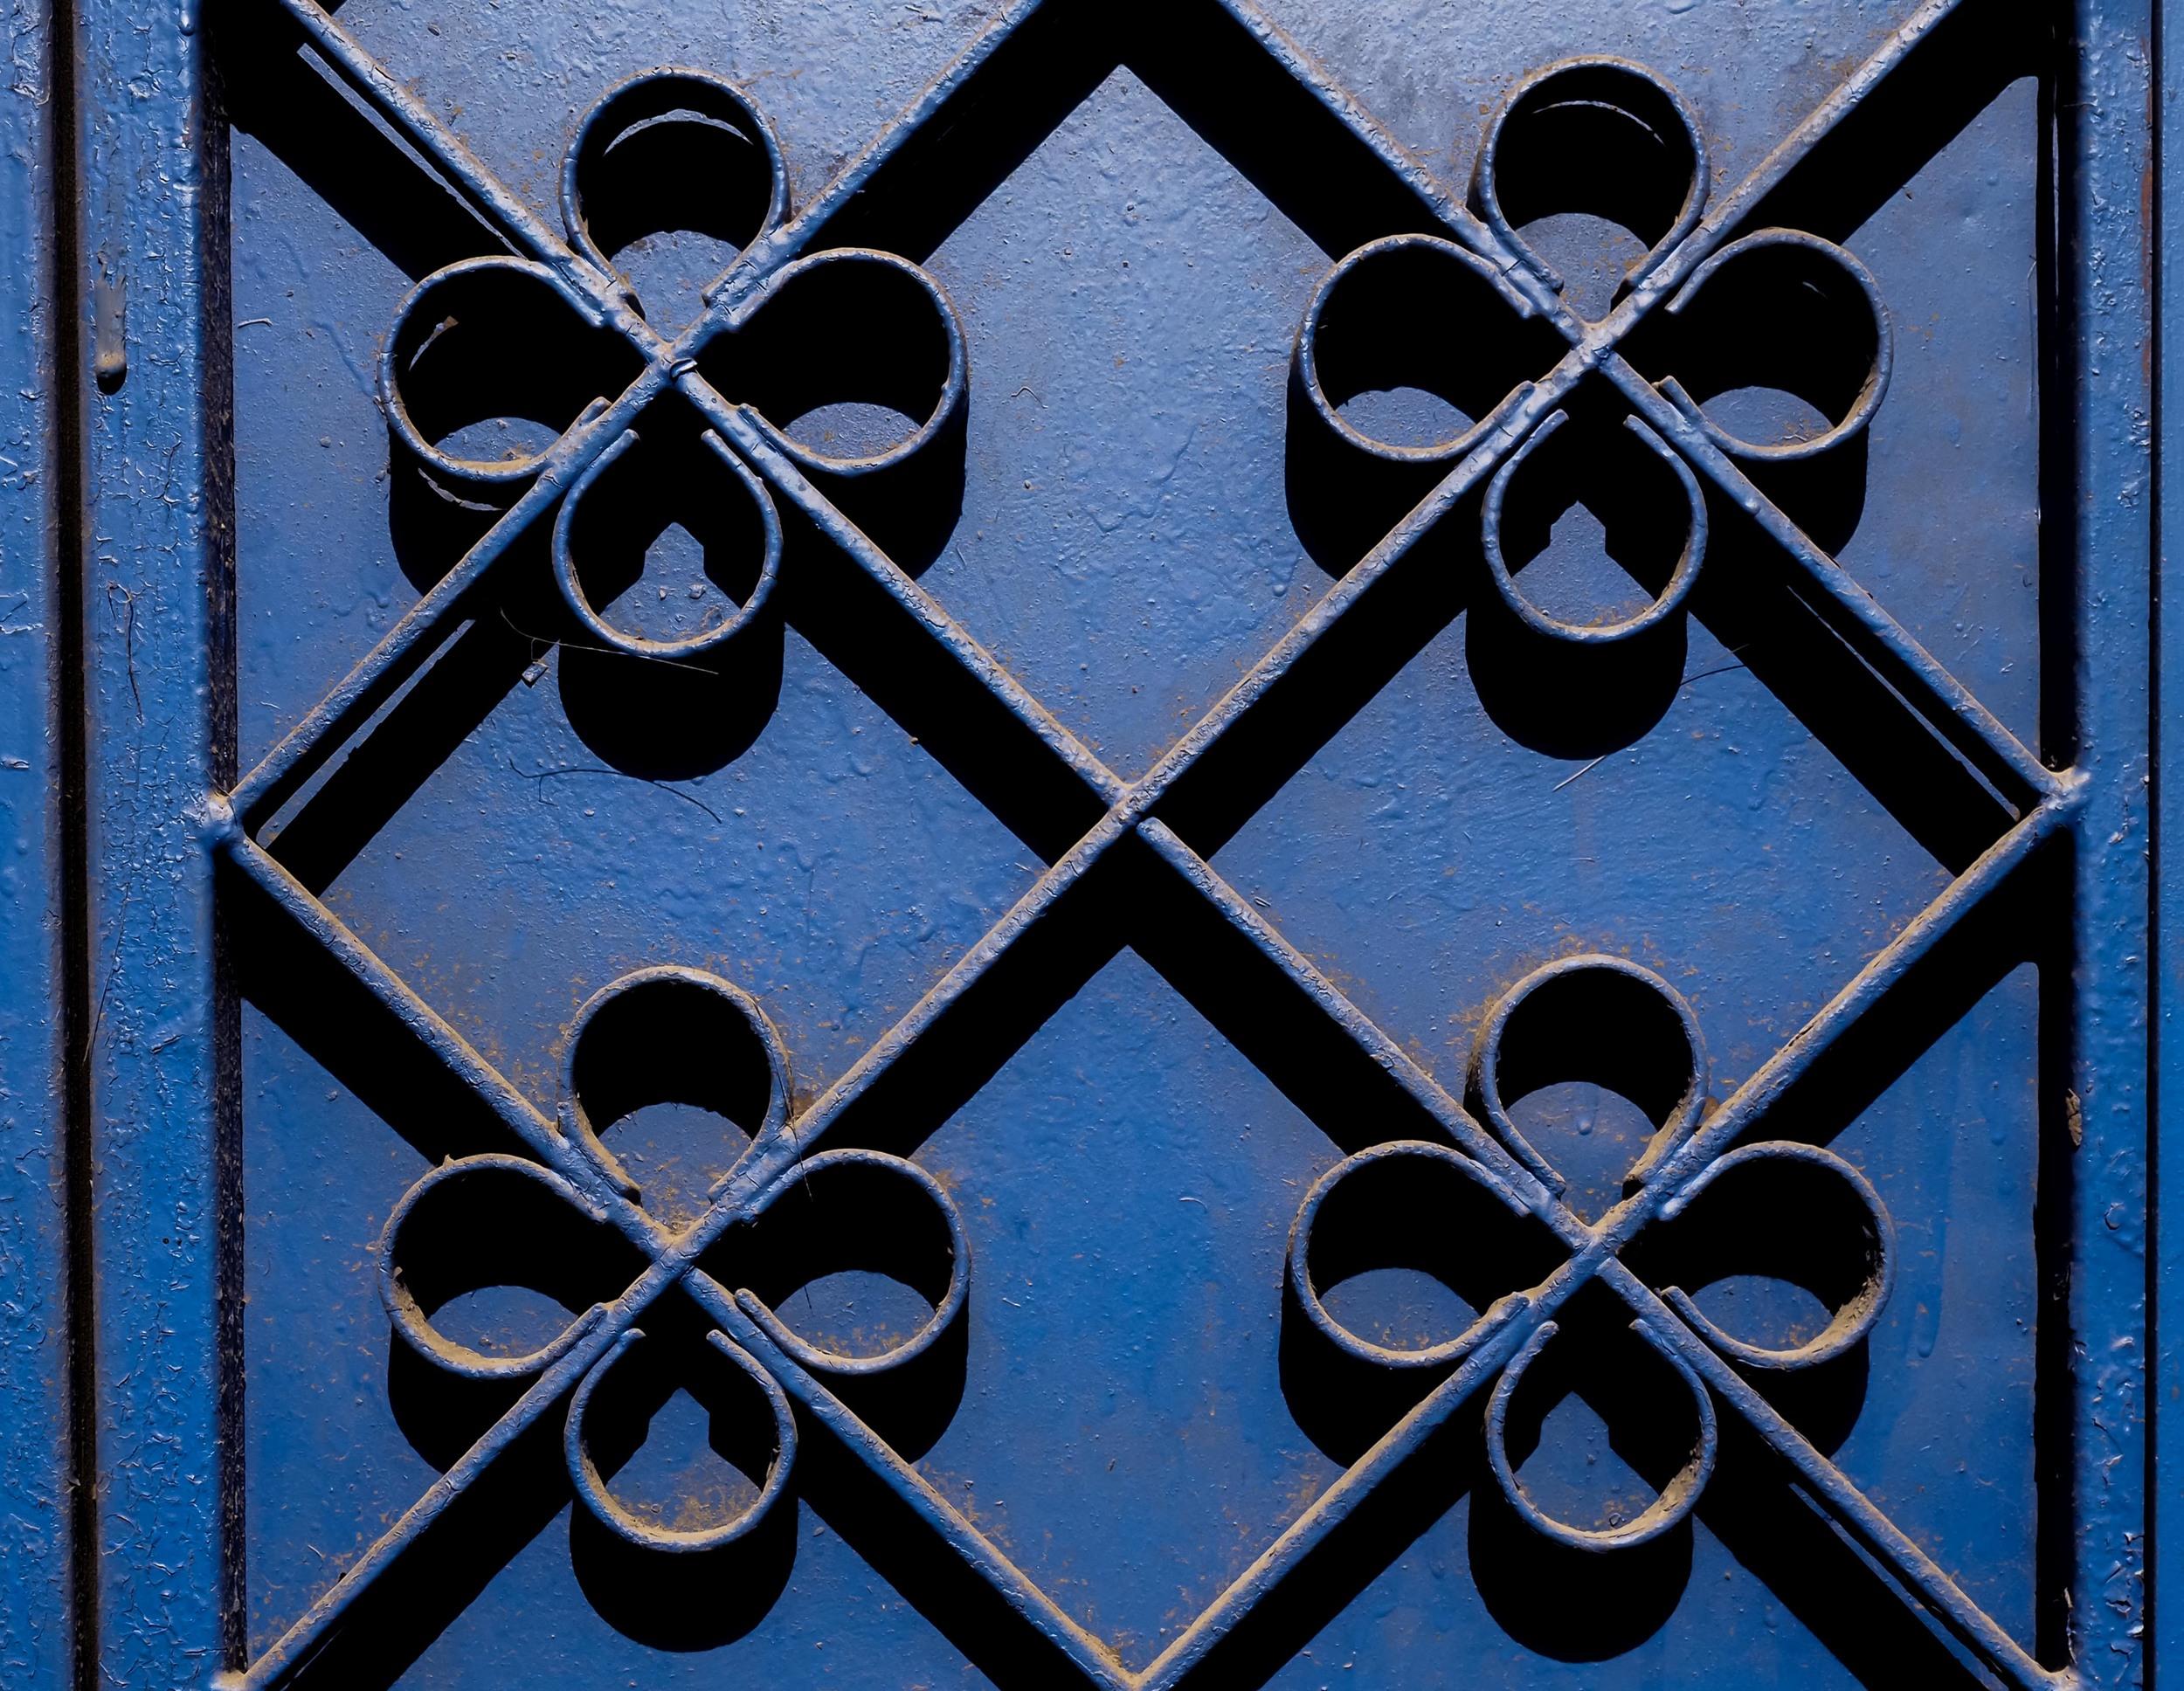 A detail of a deep blue metal door in Marrakech.